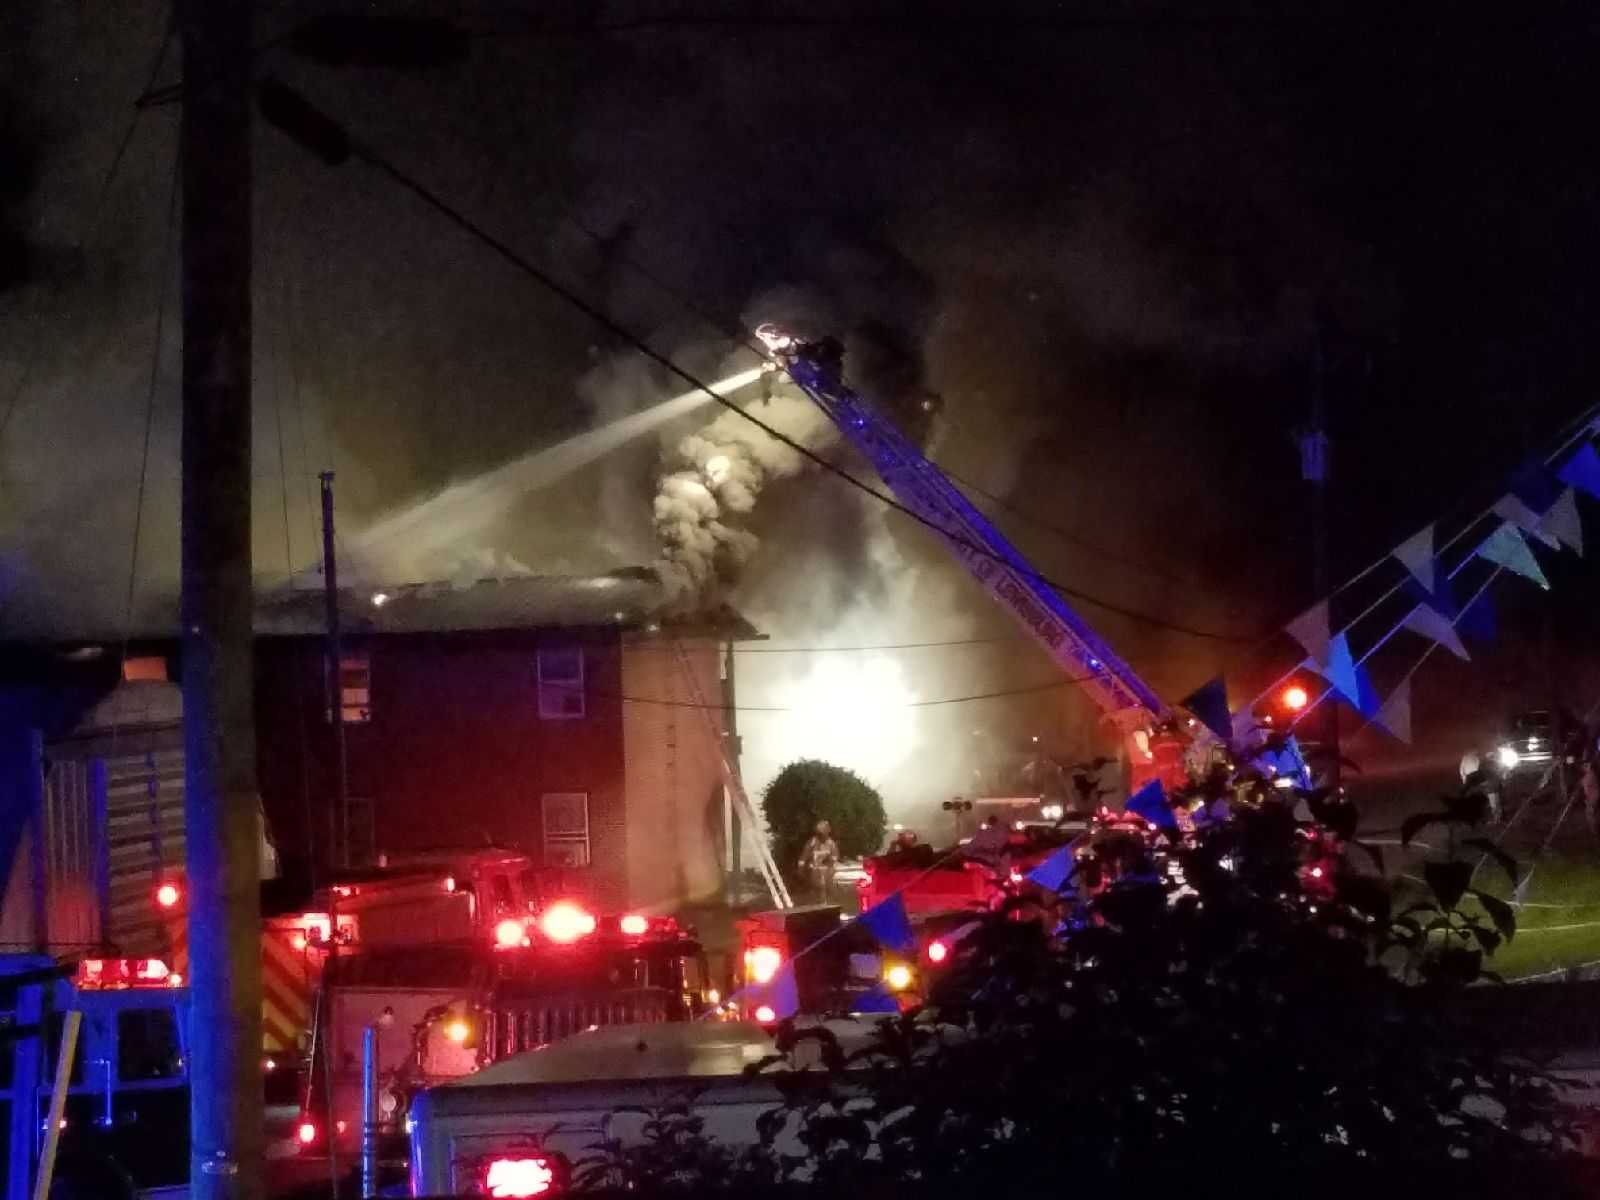 Fairlea apartment fire